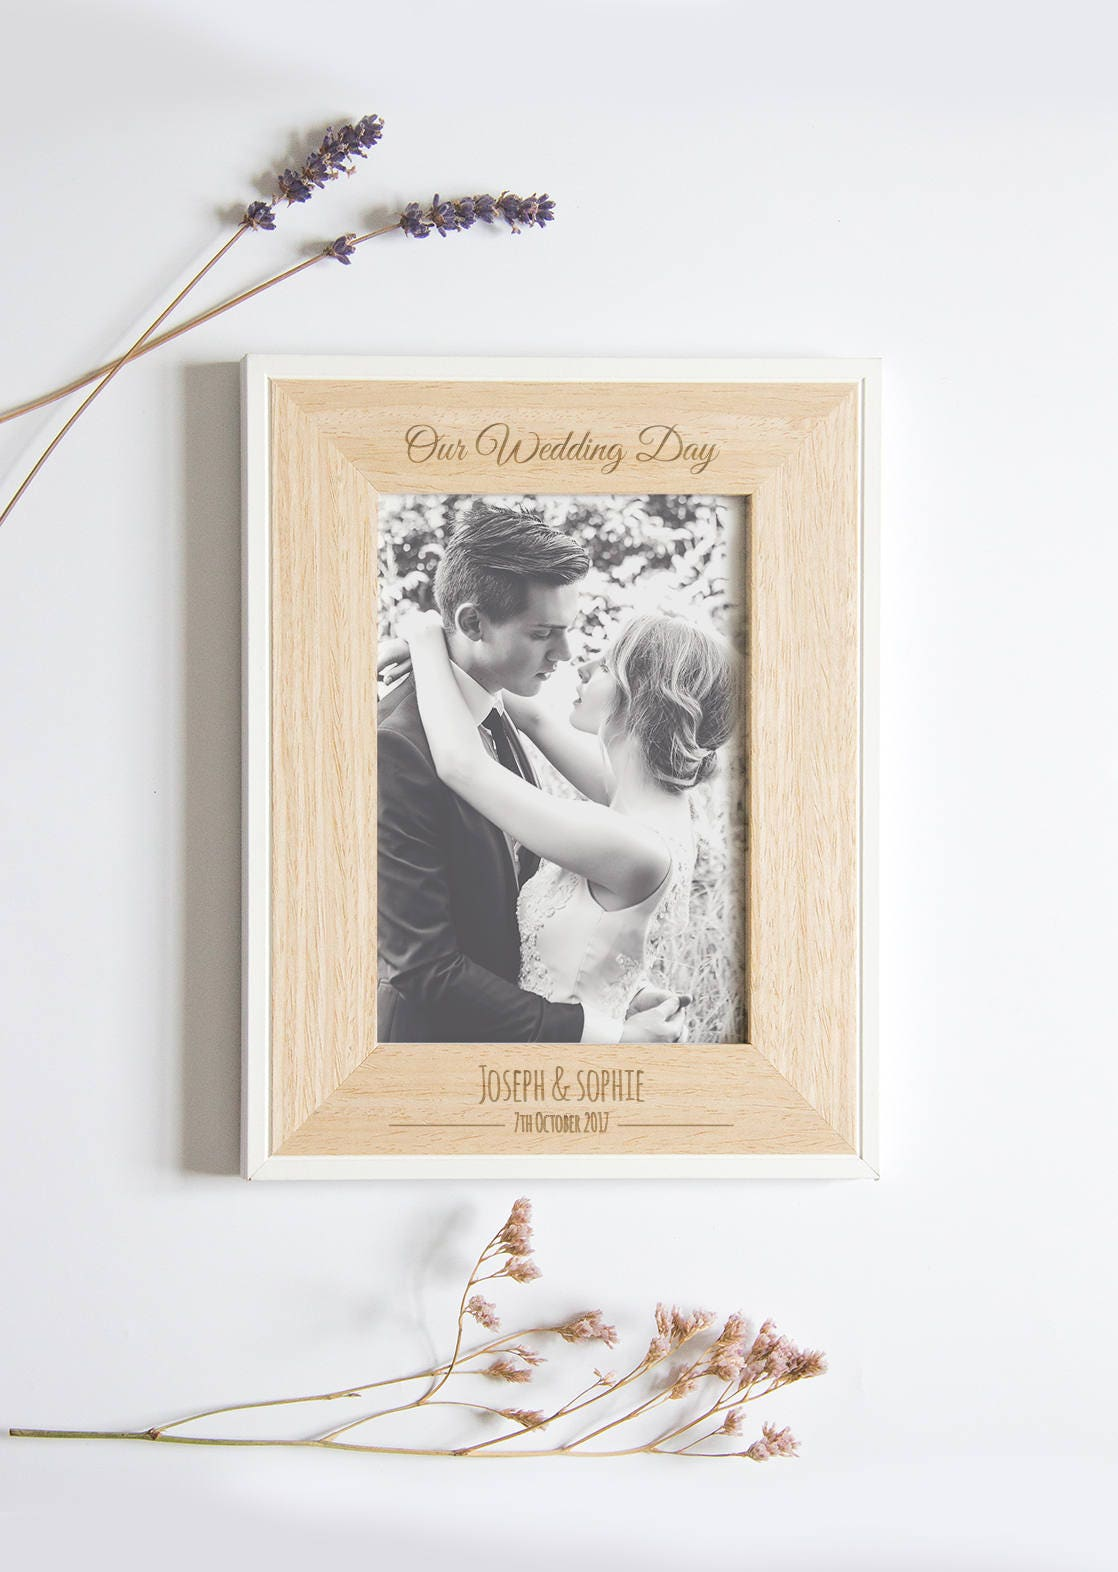 Personalisierte Bilderrahmen Hochzeit Hochzeits-Bilderrahmen